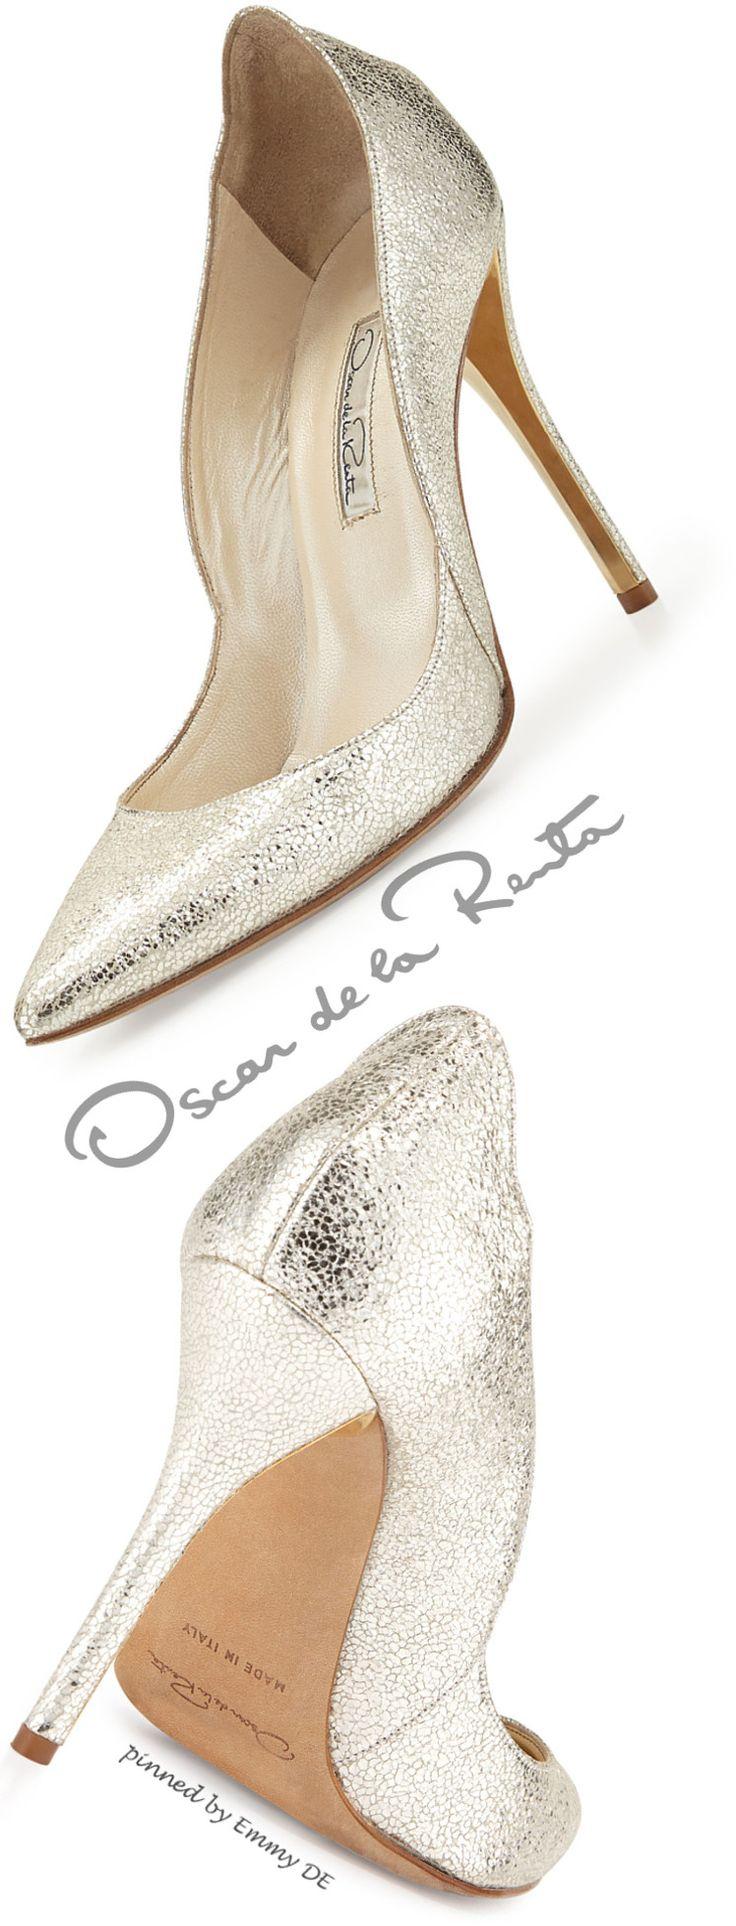 Brilliant Luxury ♦ Oscar de la Renta crinkled metallic leather pump in #gold